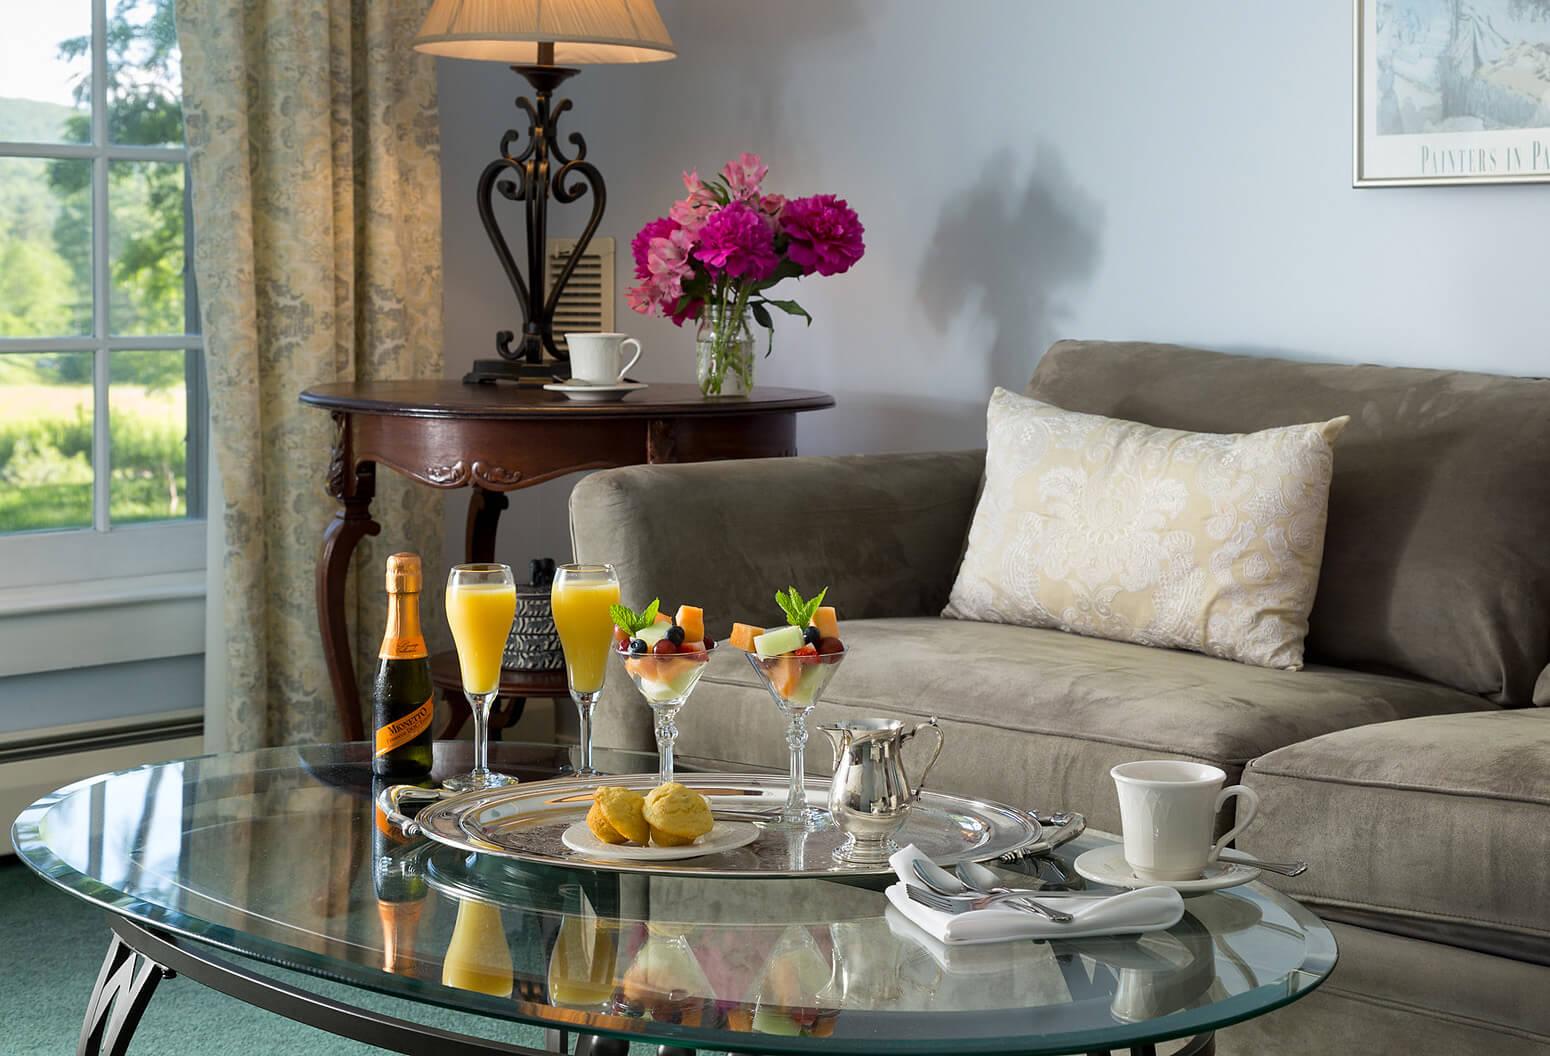 breakfast tray on coffee table in hotel room